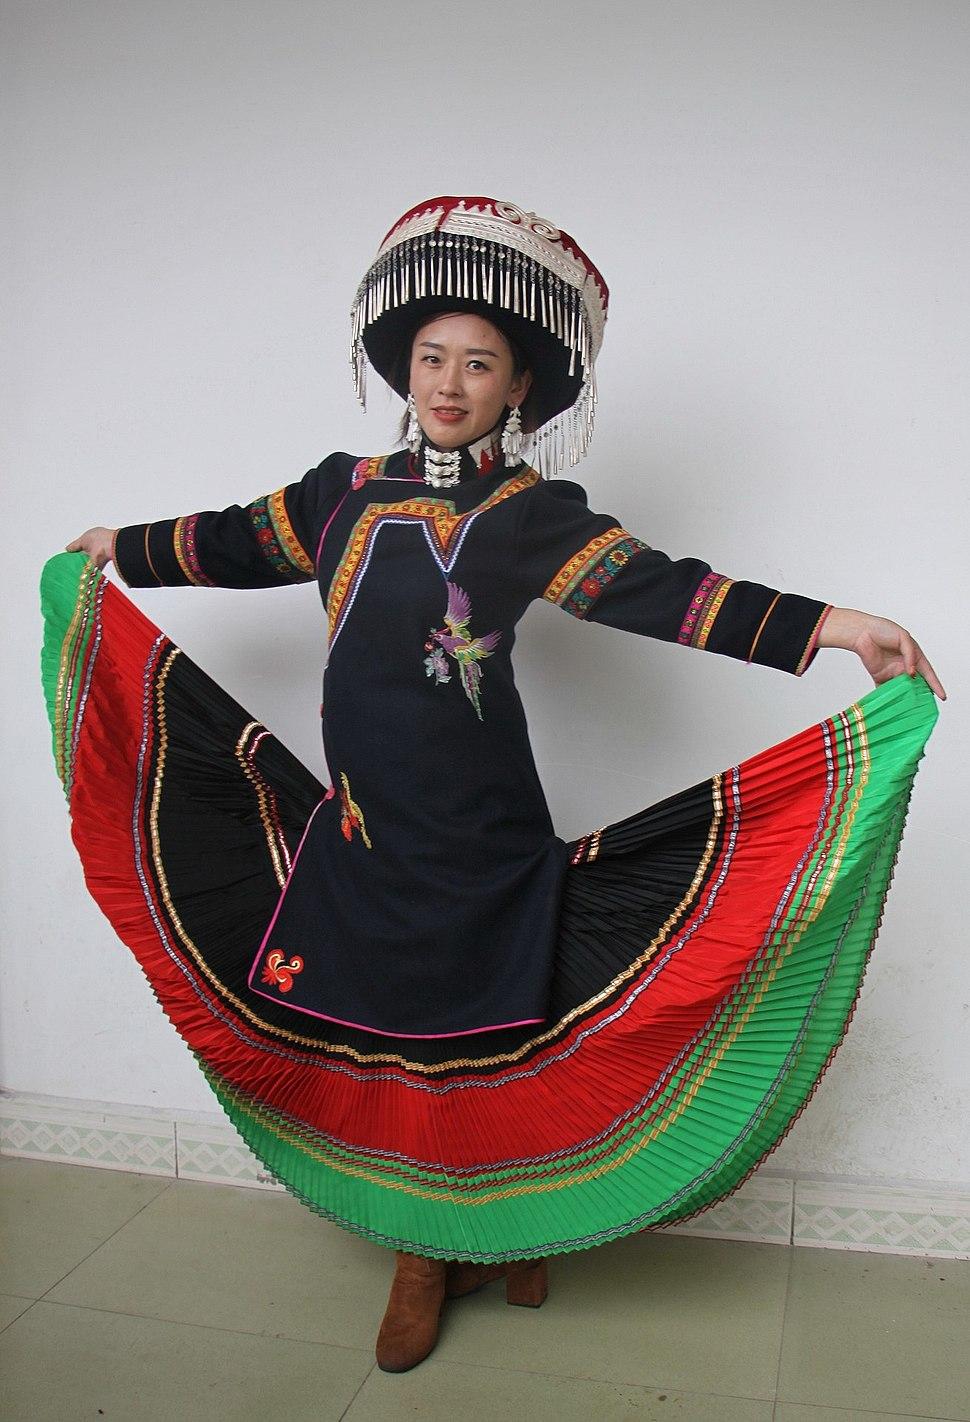 00 Yi minority in traditional 00.jpg